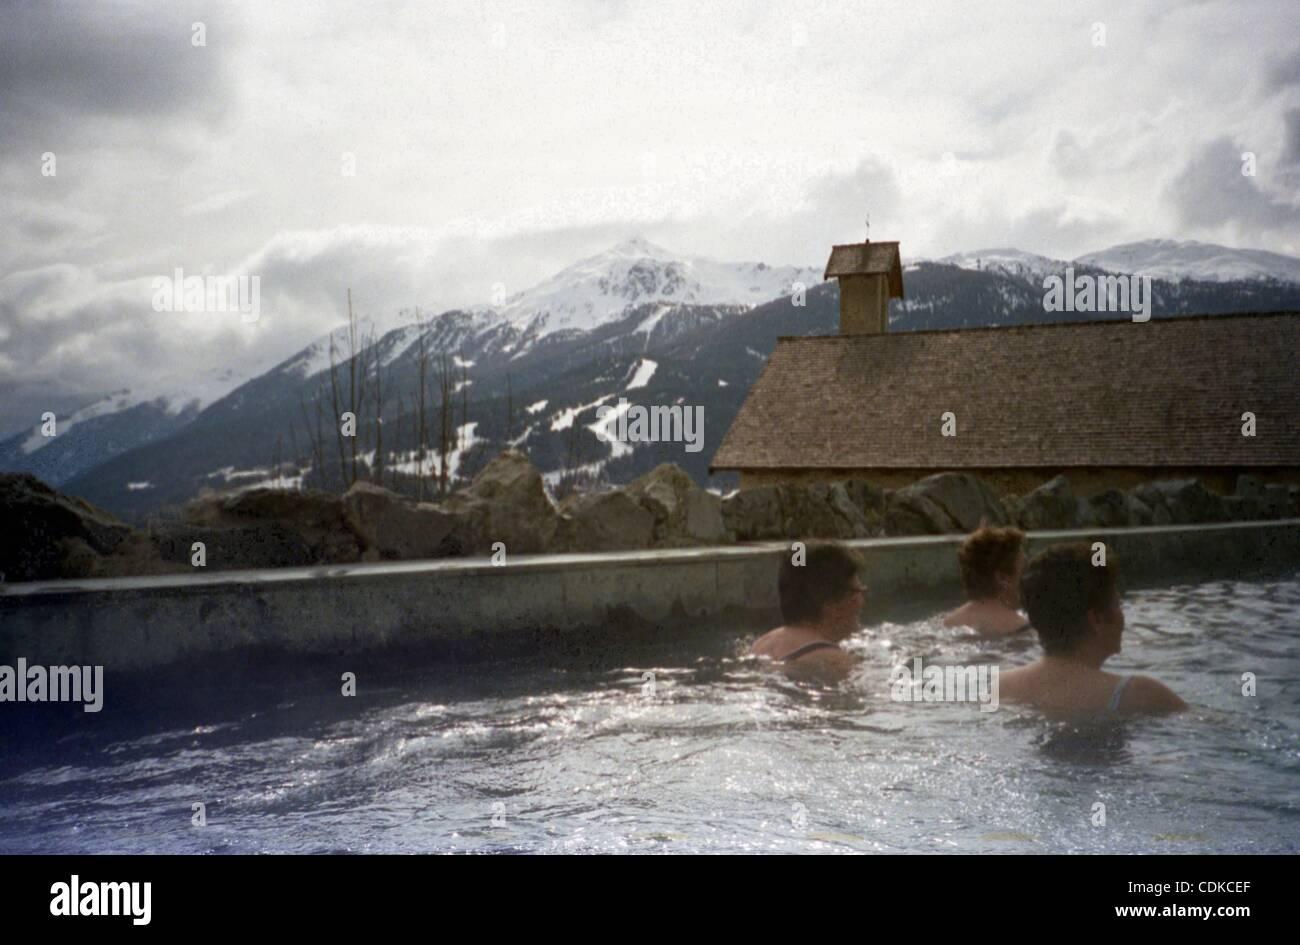 https://c8.alamy.com/comp/CDKCEF/mar-16-2011-bormio-italy-open-air-hot-springs-pool-overlooking-mountains-CDKCEF.jpg